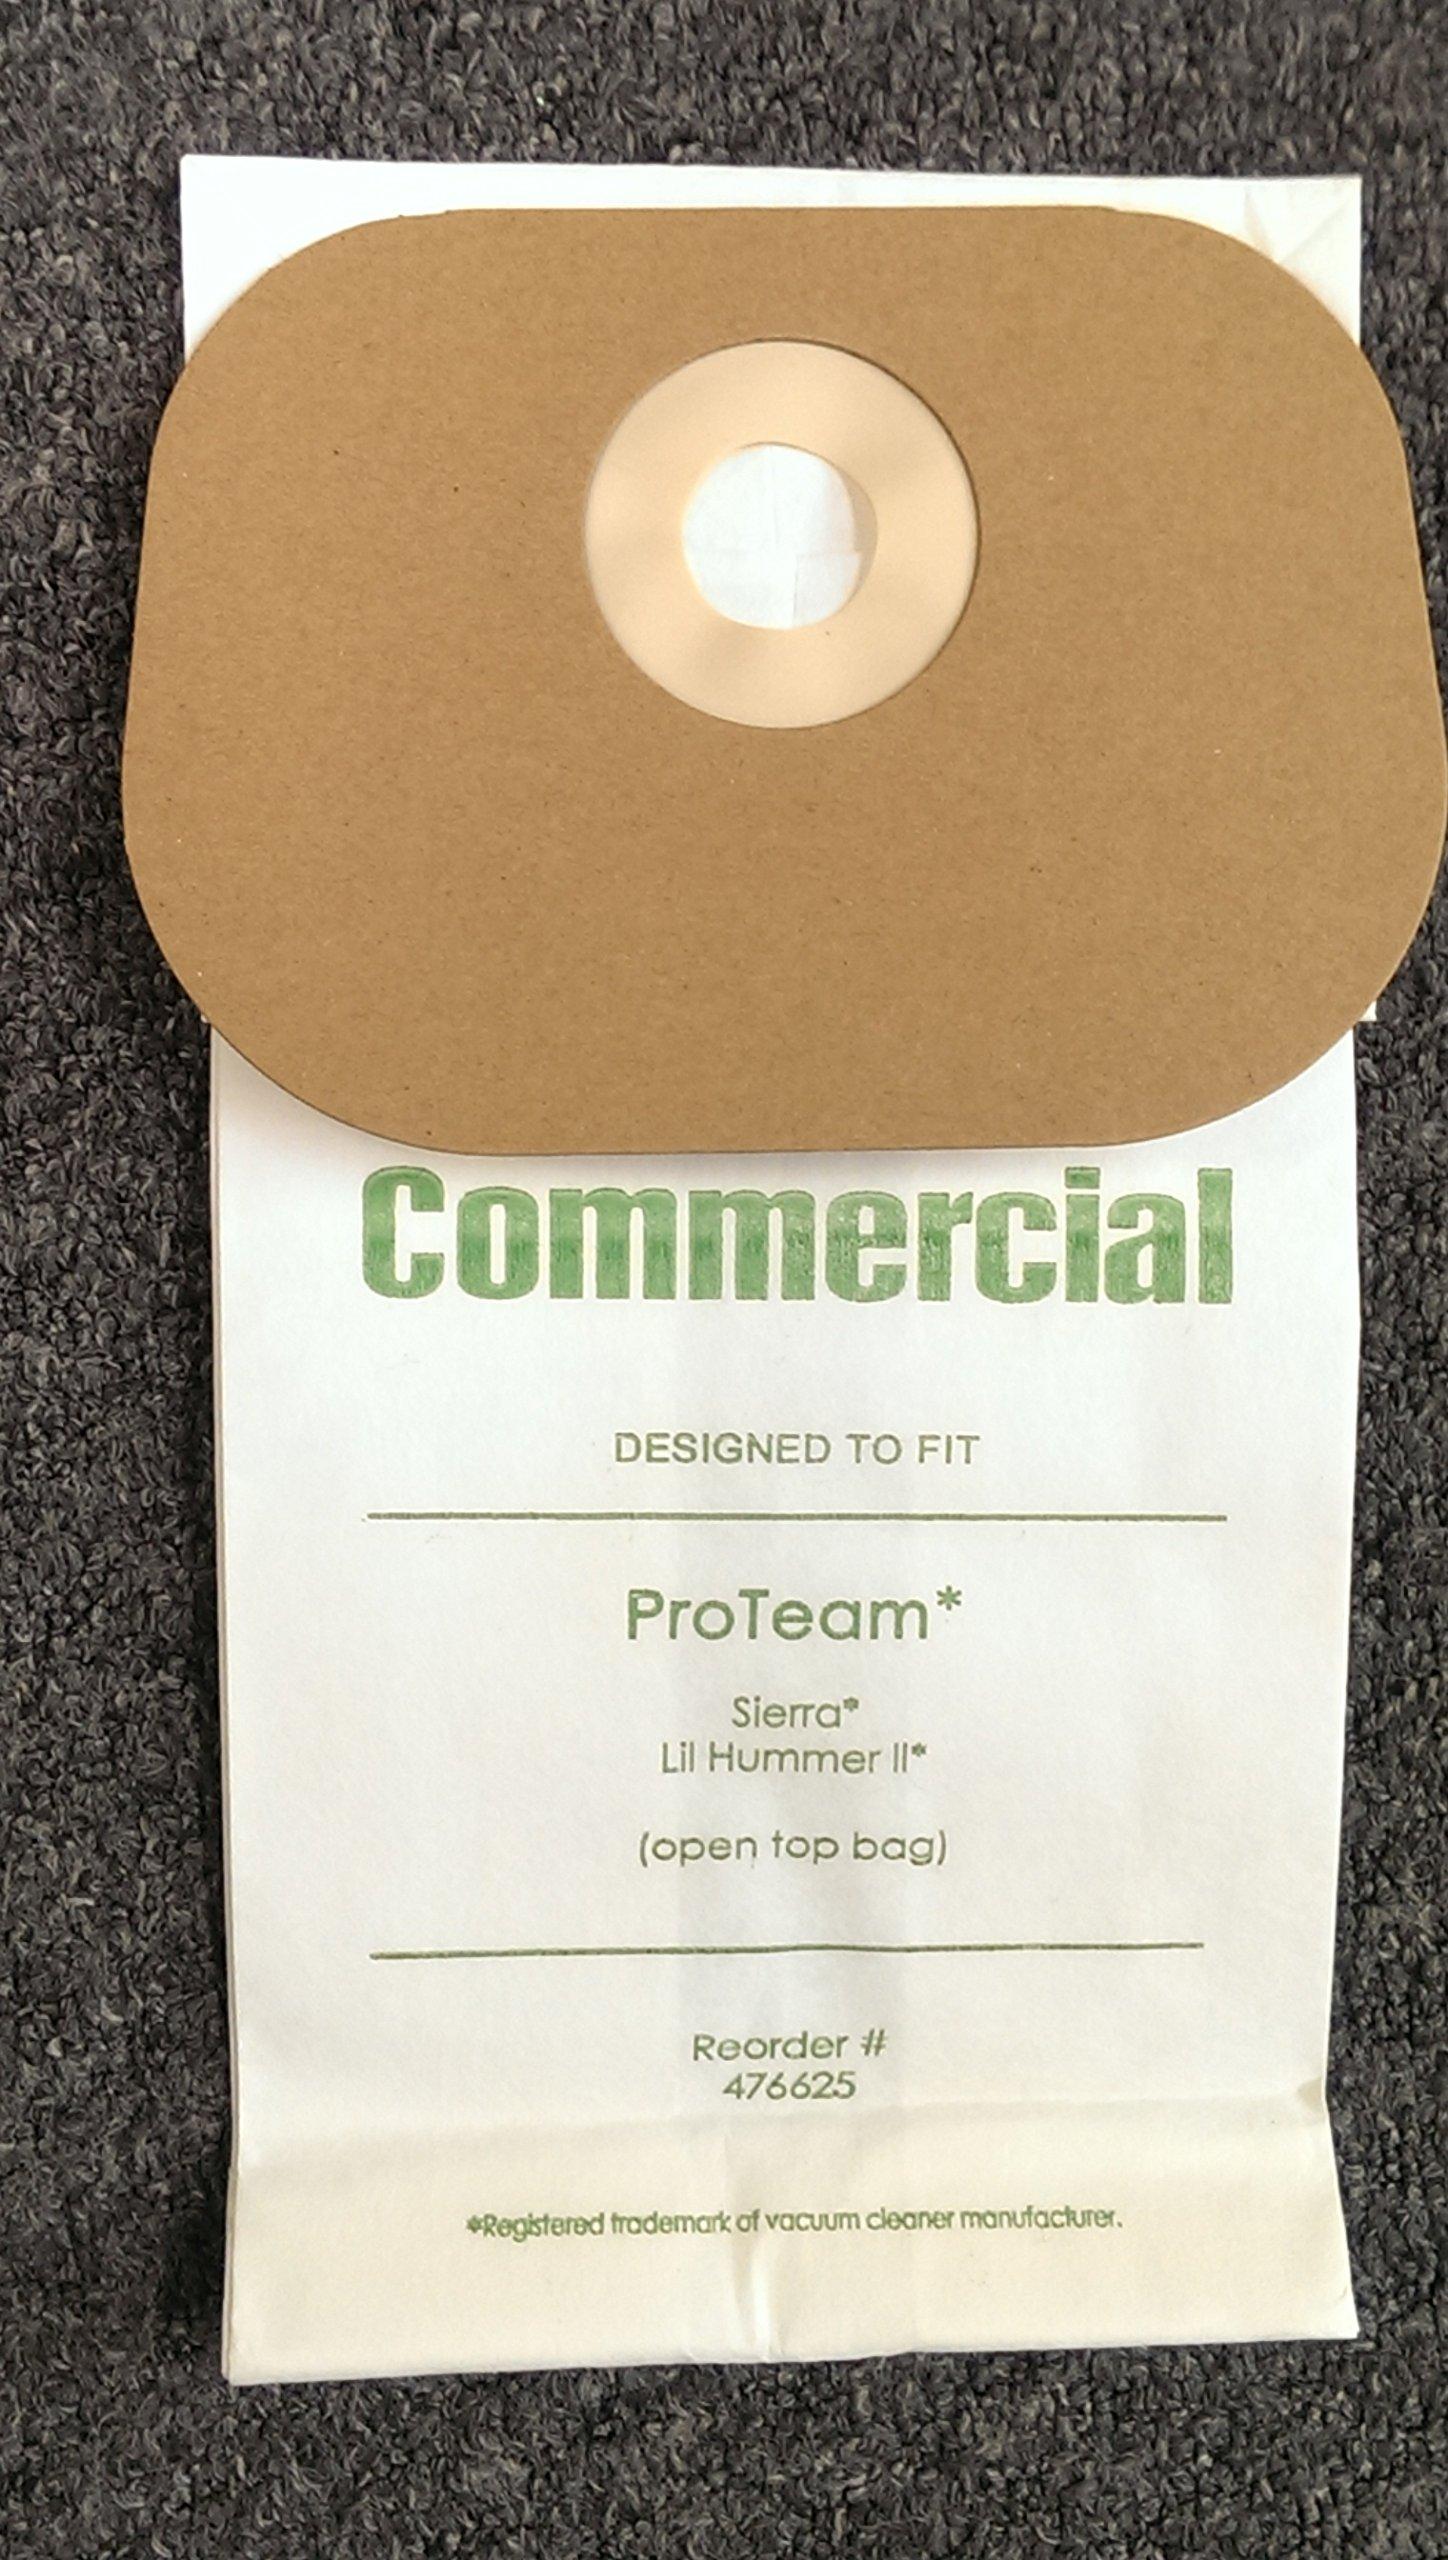 20 Commercial Vacuum Cleaner Allergy Bag ProTeam 103227, 56002 Model Sierra, Speedster 600 Backpack, Hawk Breeze, Lil' Hummer II